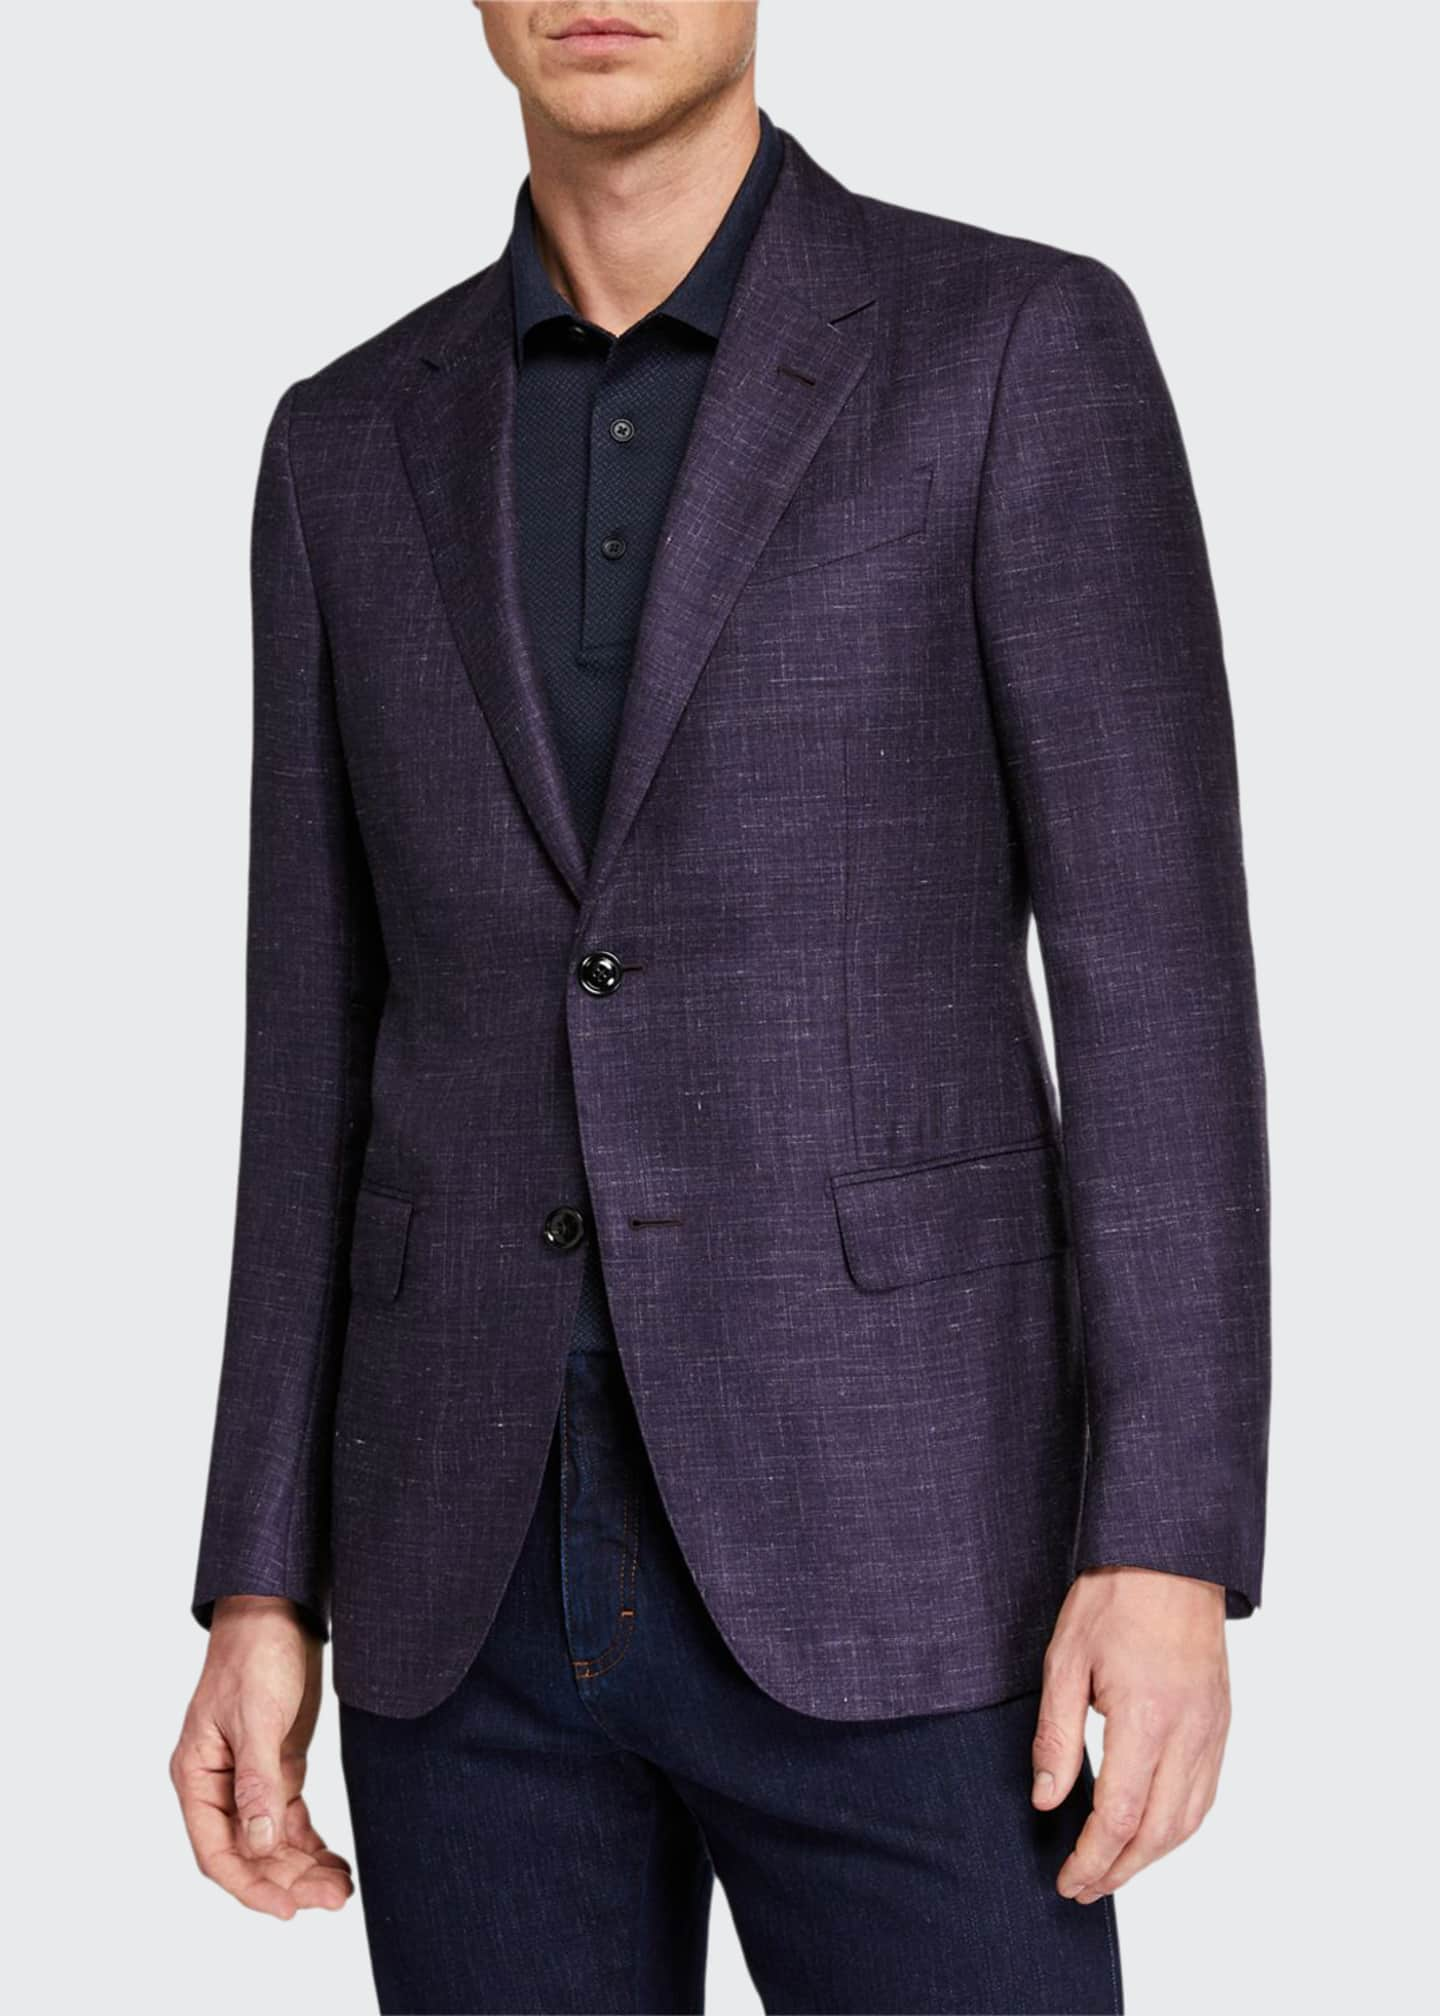 Ermenegildo Zegna Men's Heathered Cashmere-Silk Blazer